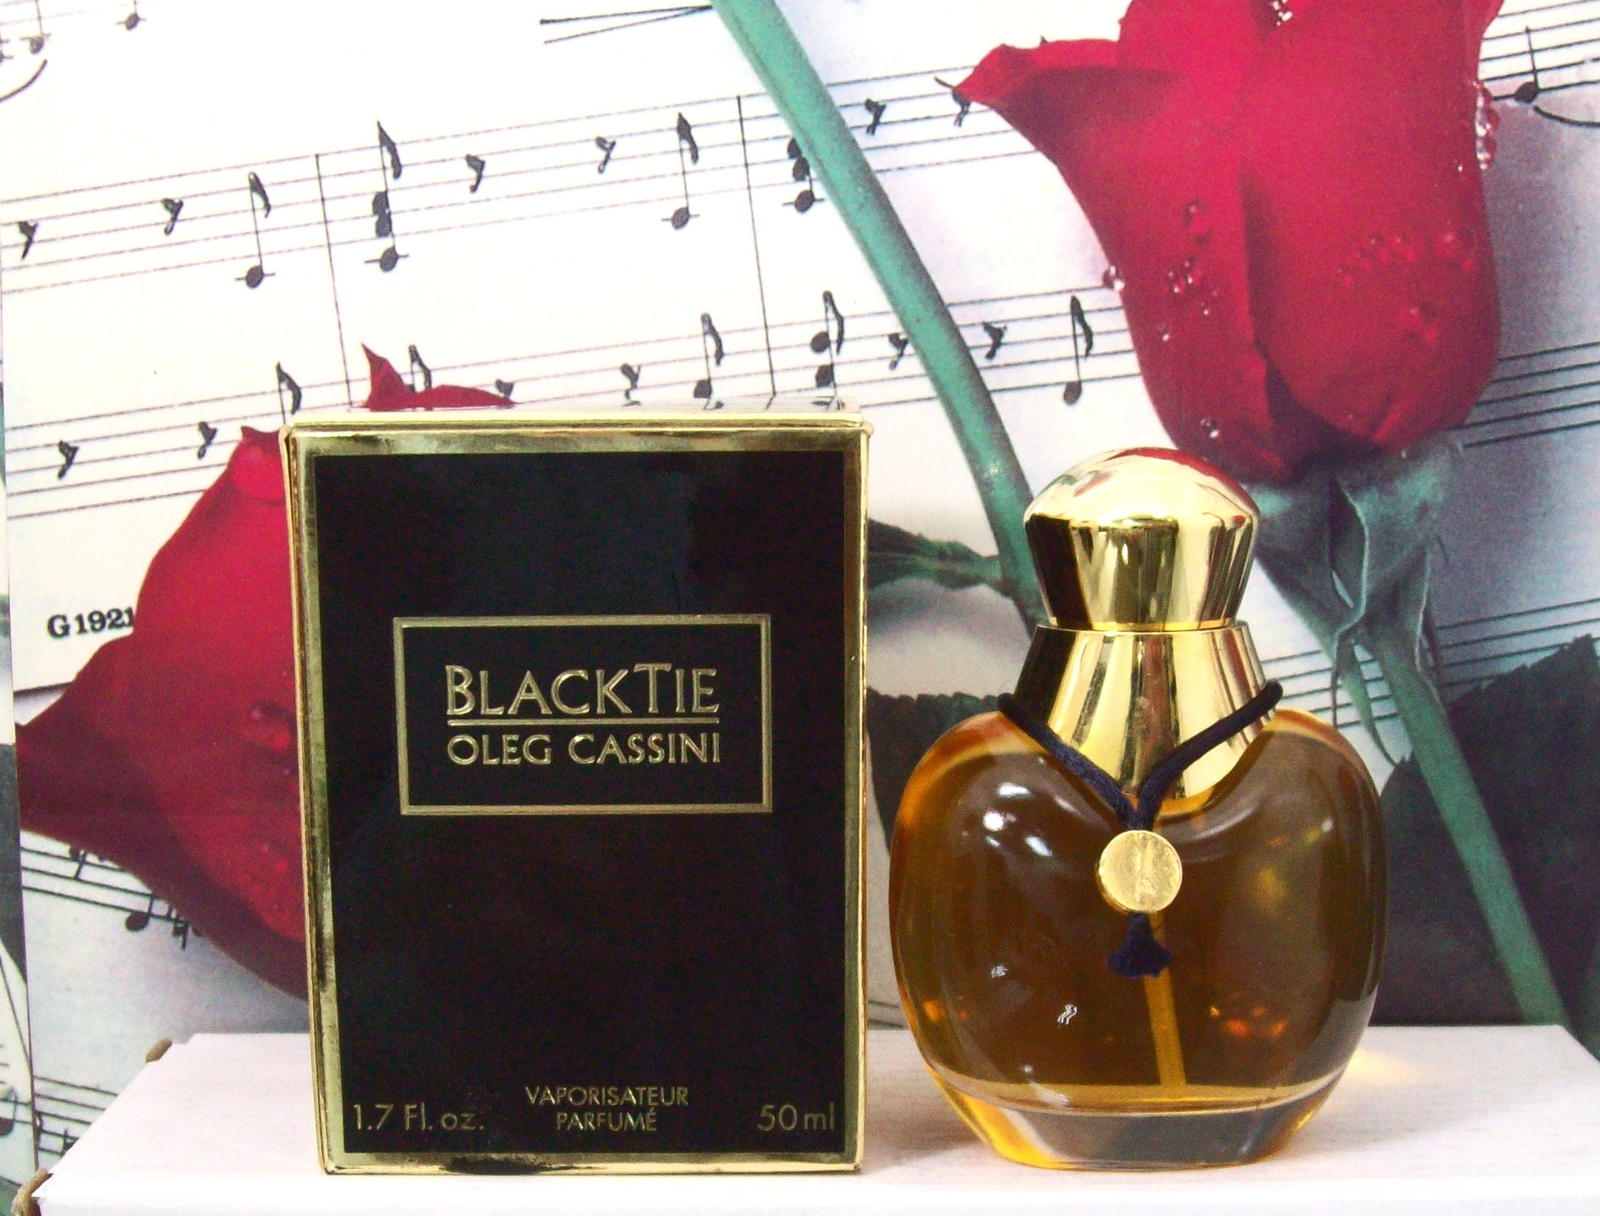 Black Tie By Oleg Cassini Perfume Spray 1.7 FL. OZ. - $449.99